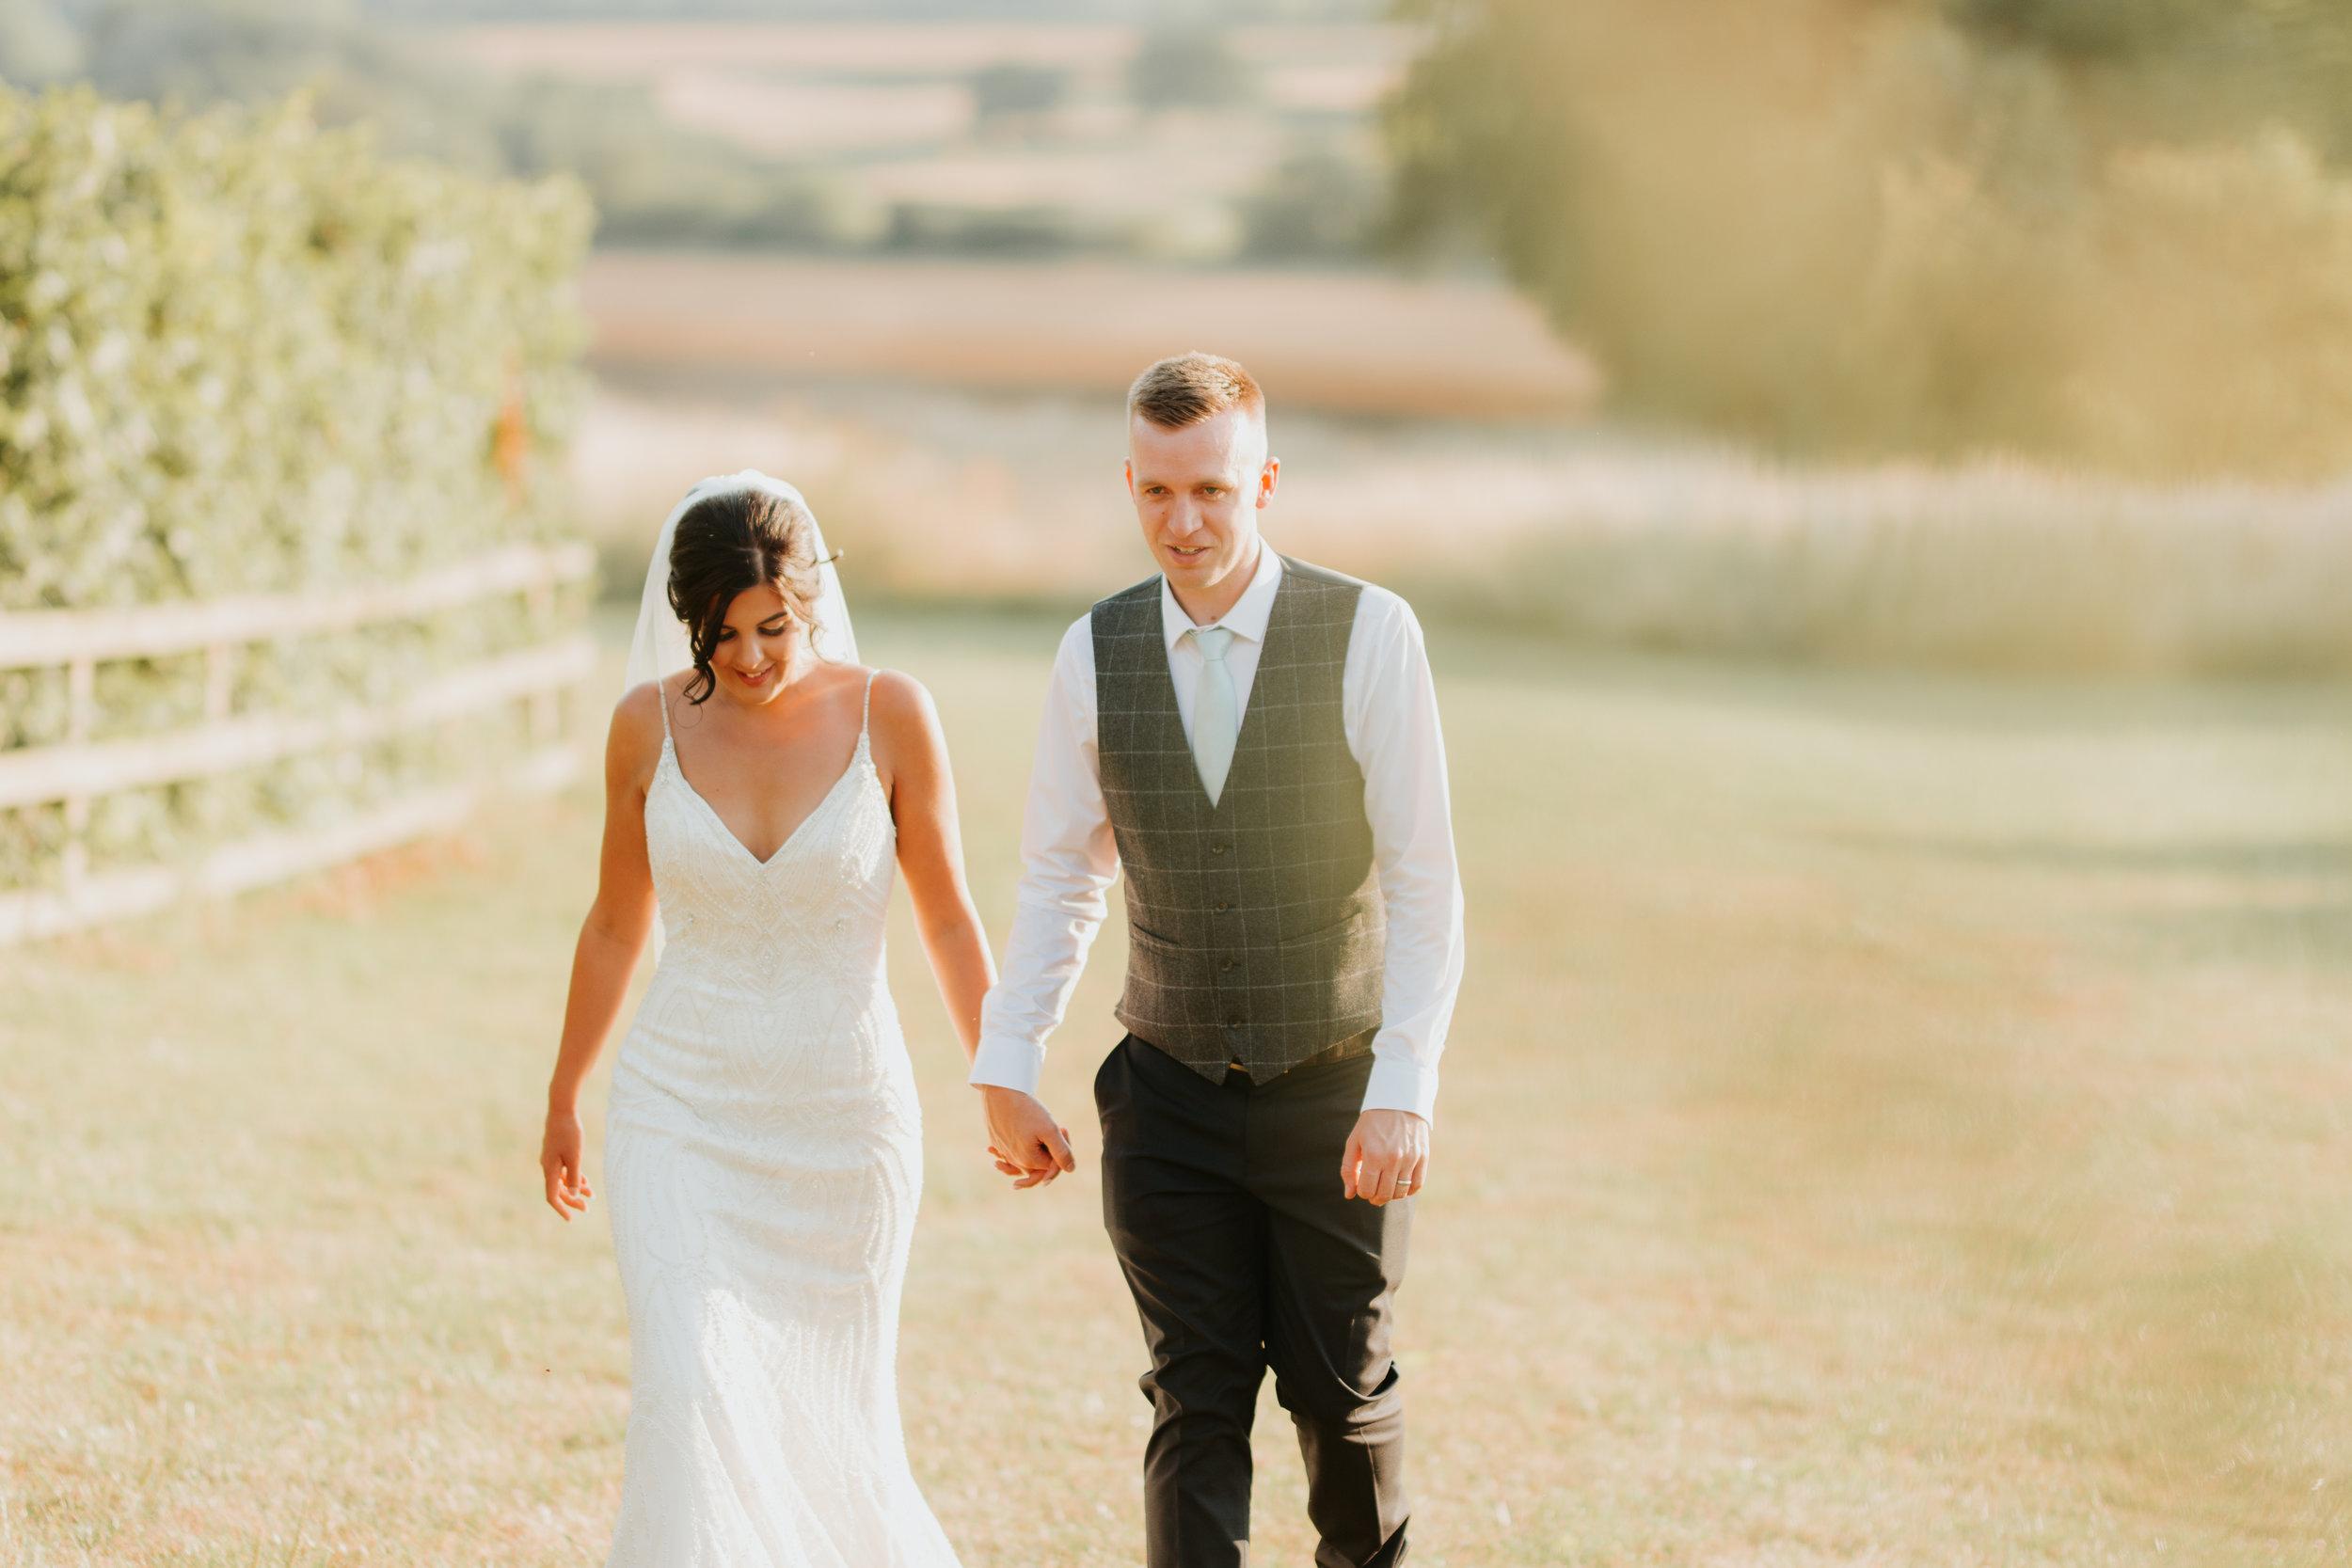 Oxfordshire-wedding-photographer-83.jpg